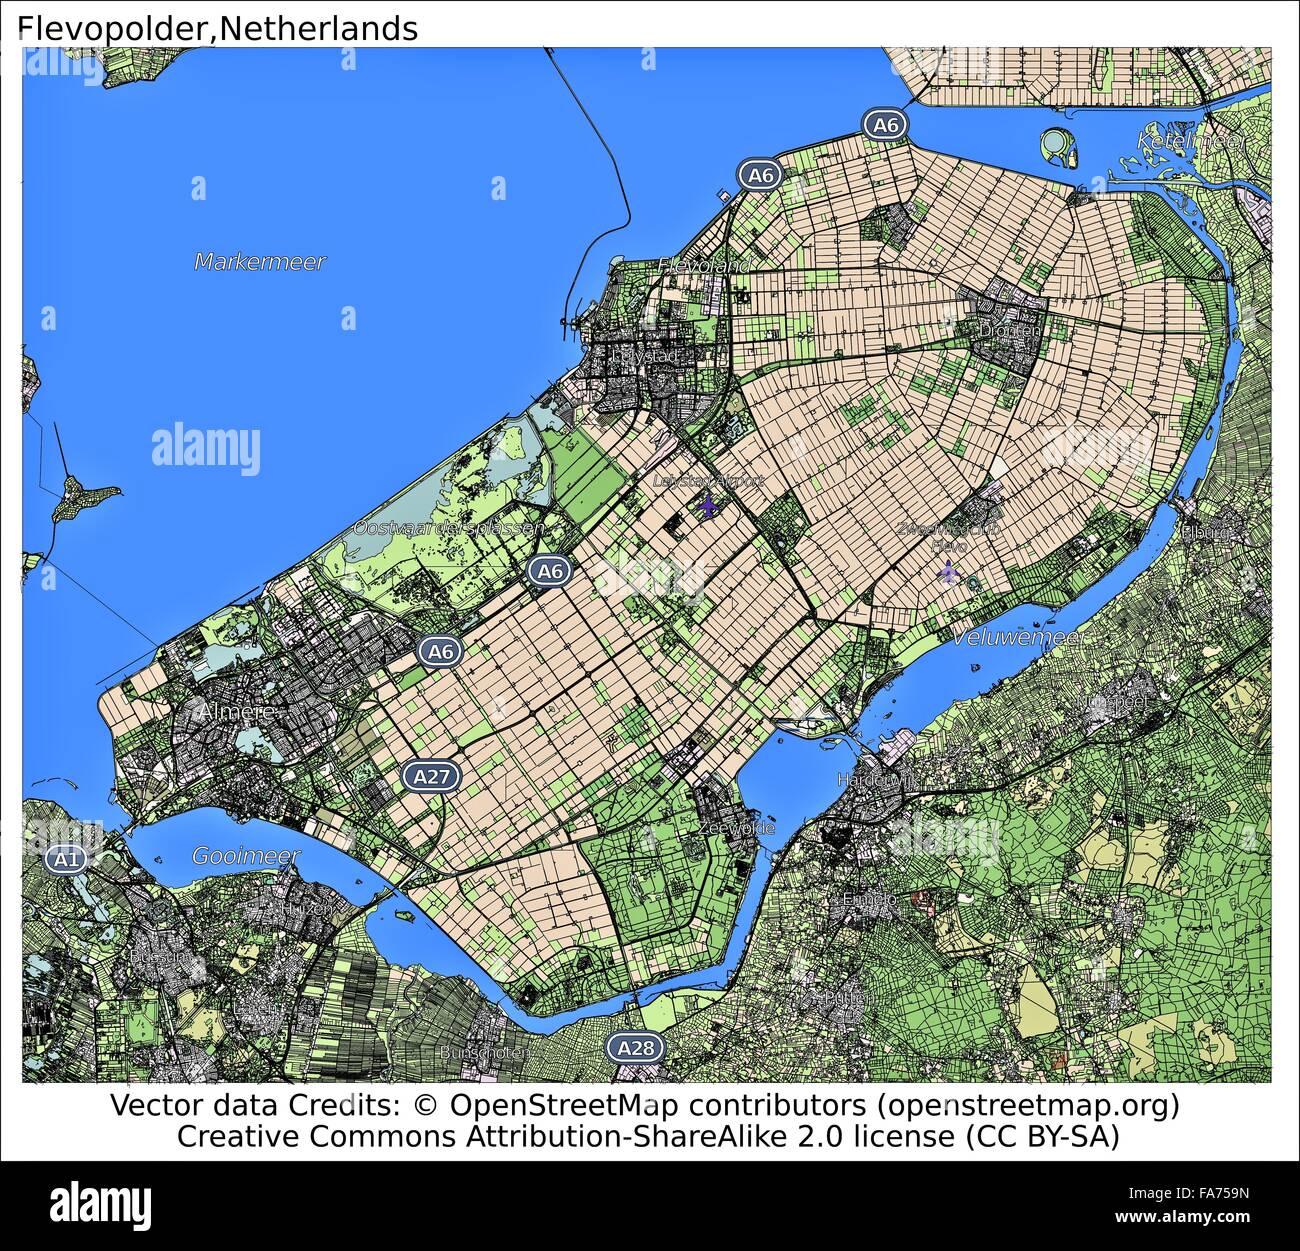 Flevopolder Netherlands Location Map Stock Photo 92356257